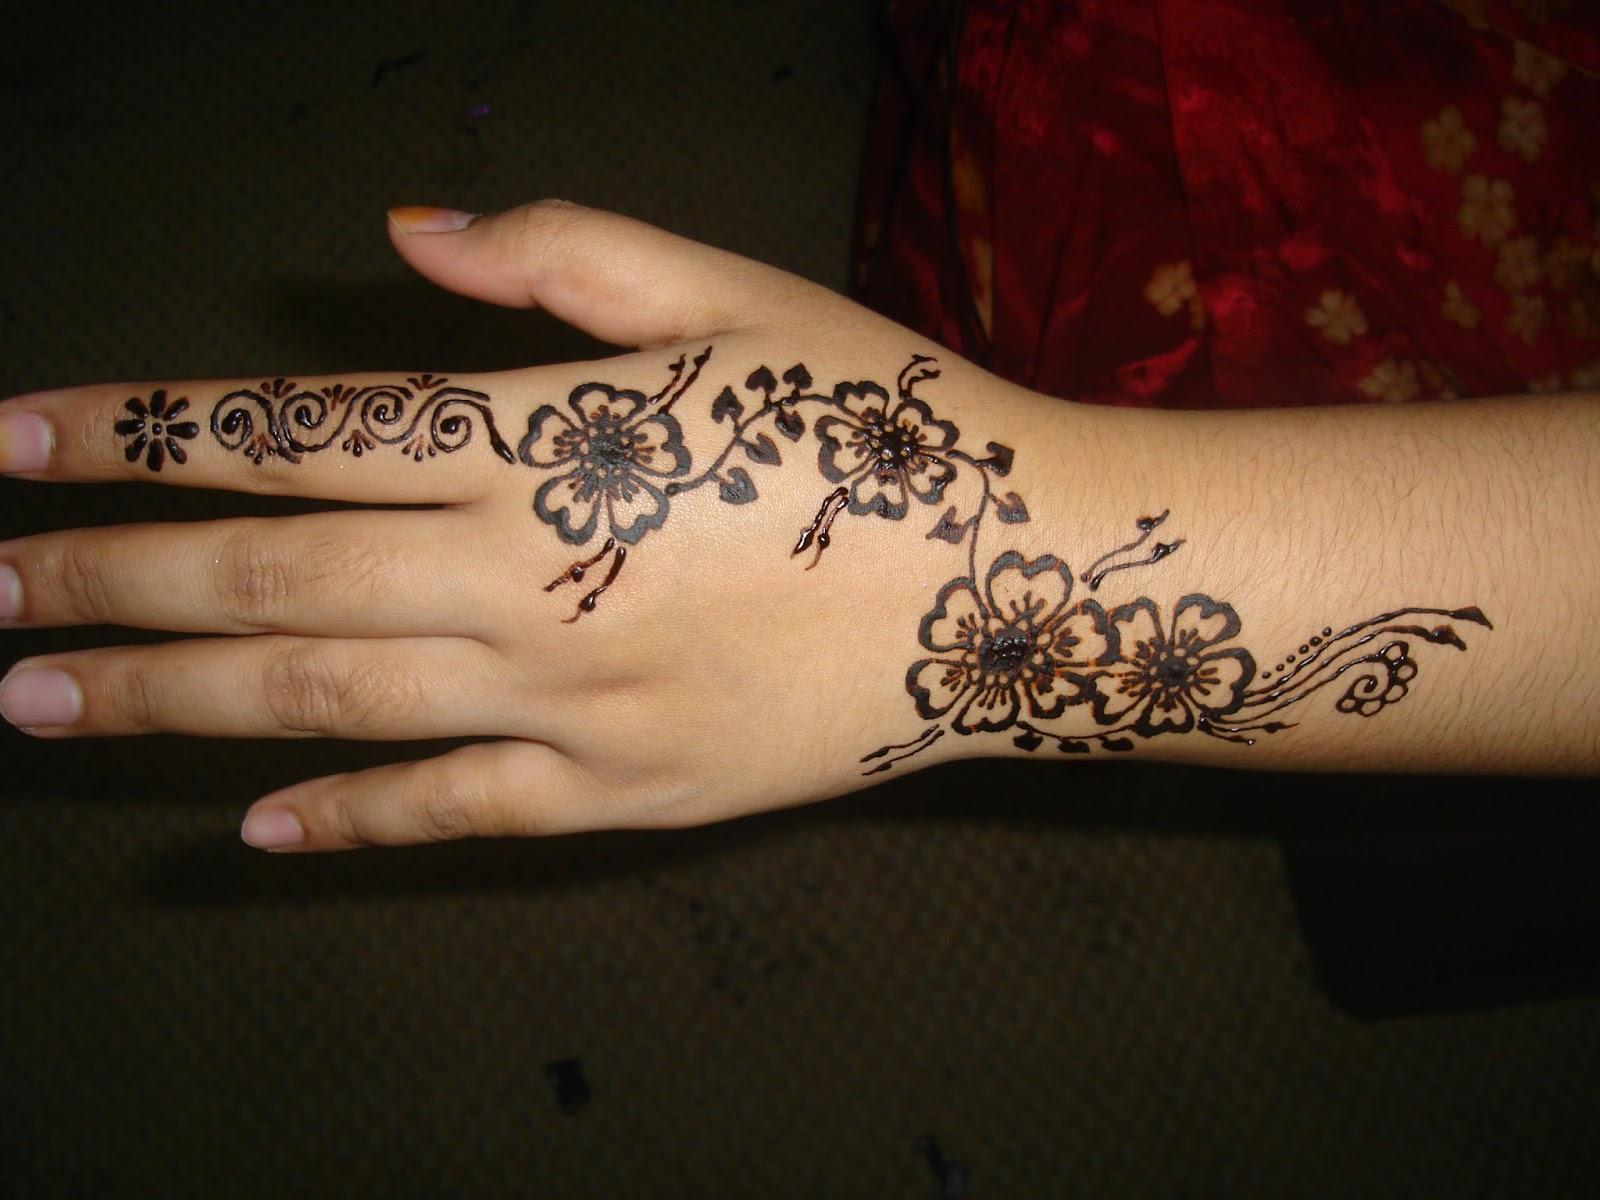 Gambar Henna Di Jari Tangan Balehenna